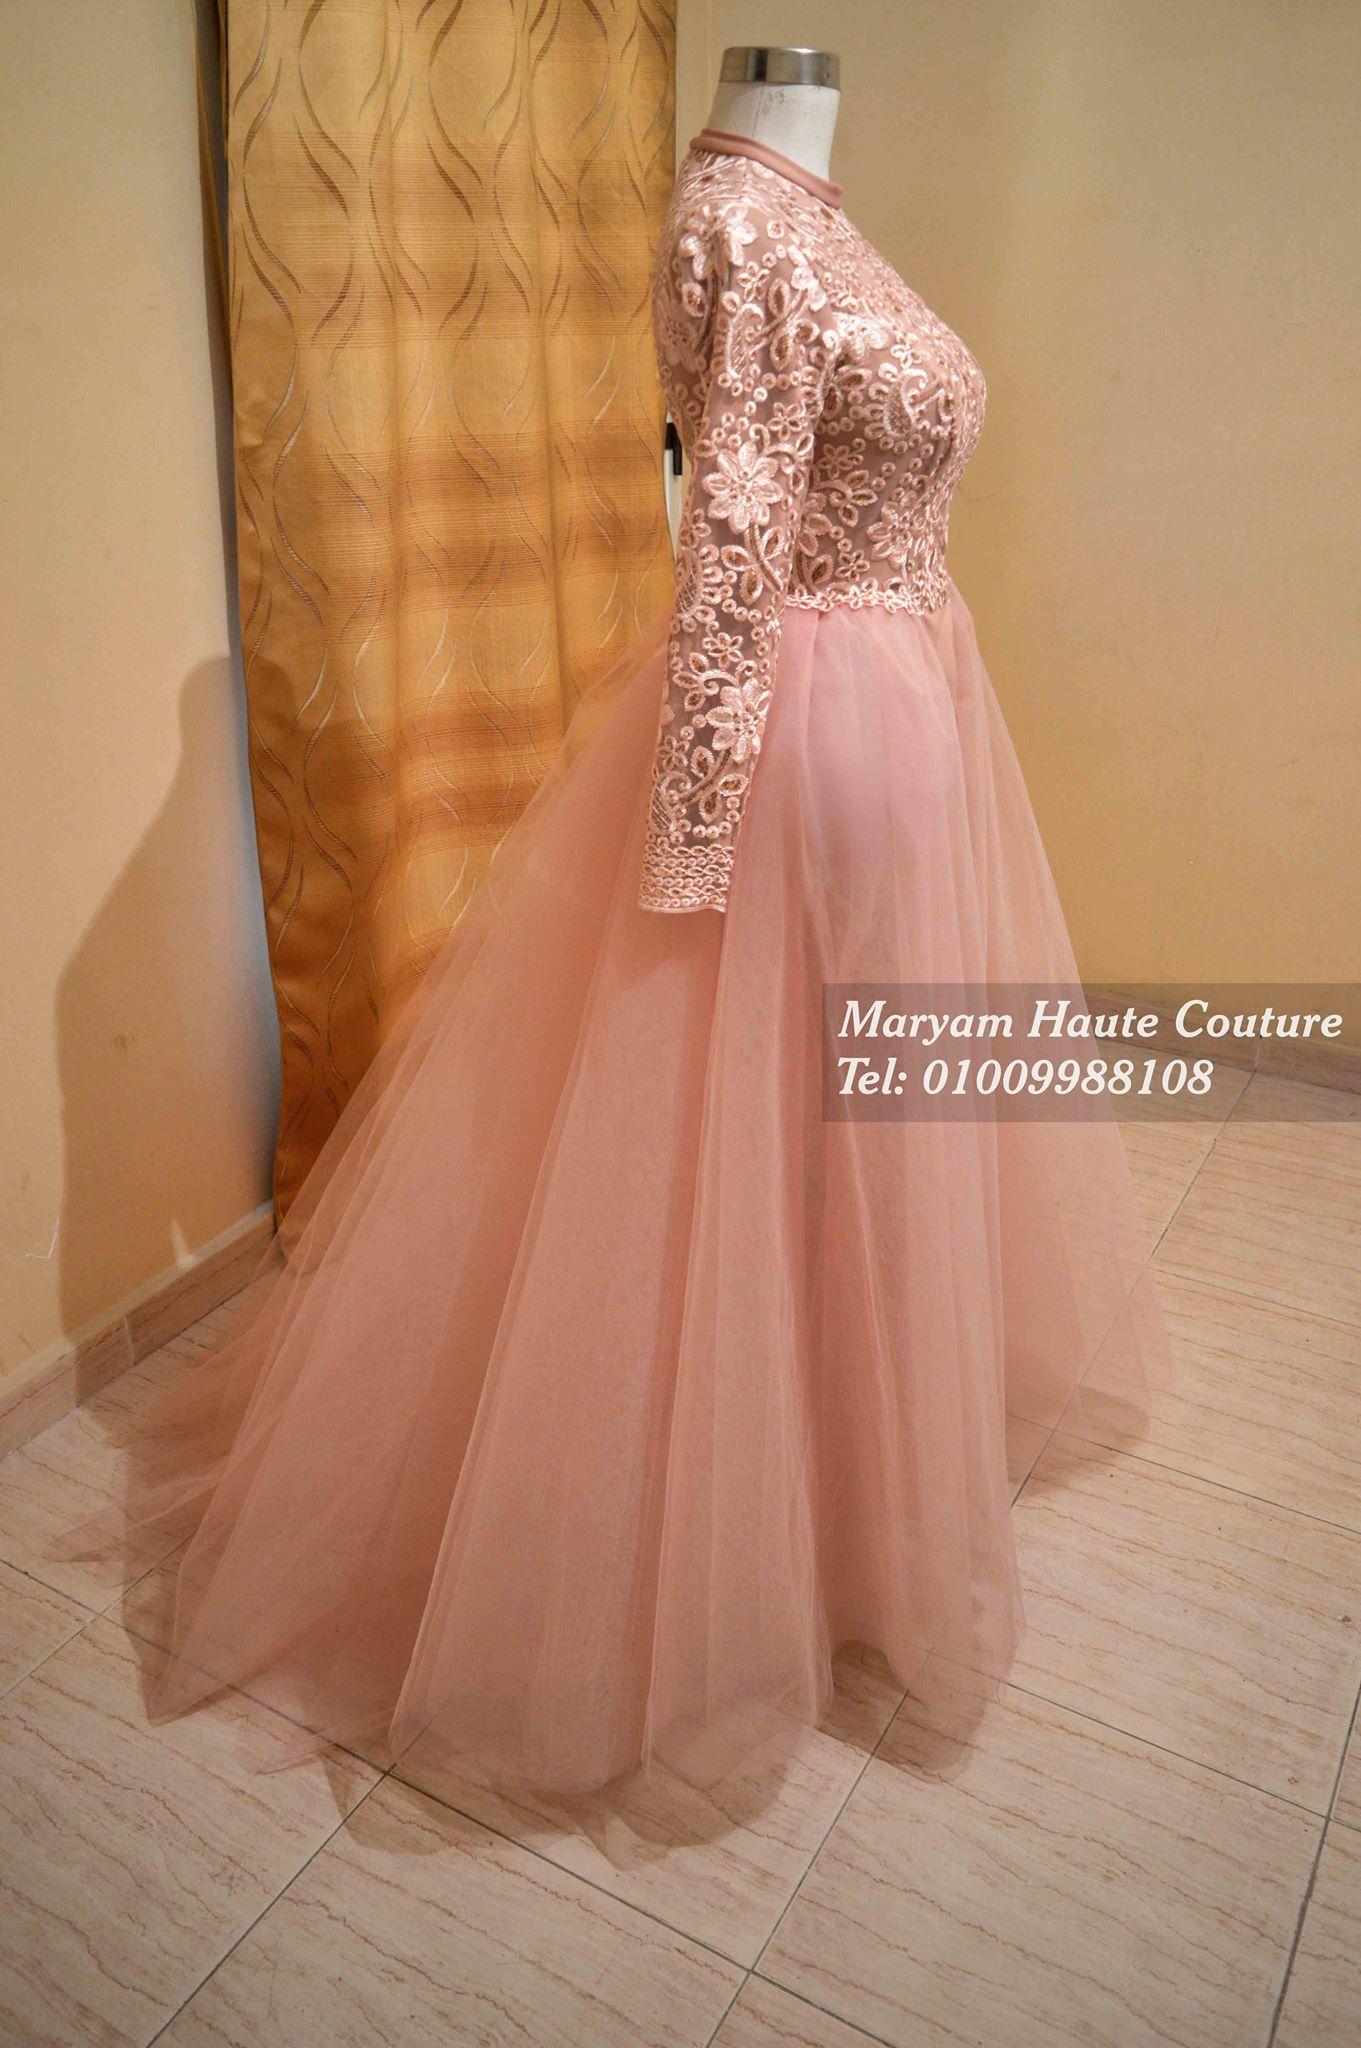 اضغطى لتشاهدى جميع صور الموديل كاملة Click To See All Model Pictures Elegant Dresses Long Dresses Bridal Skirts